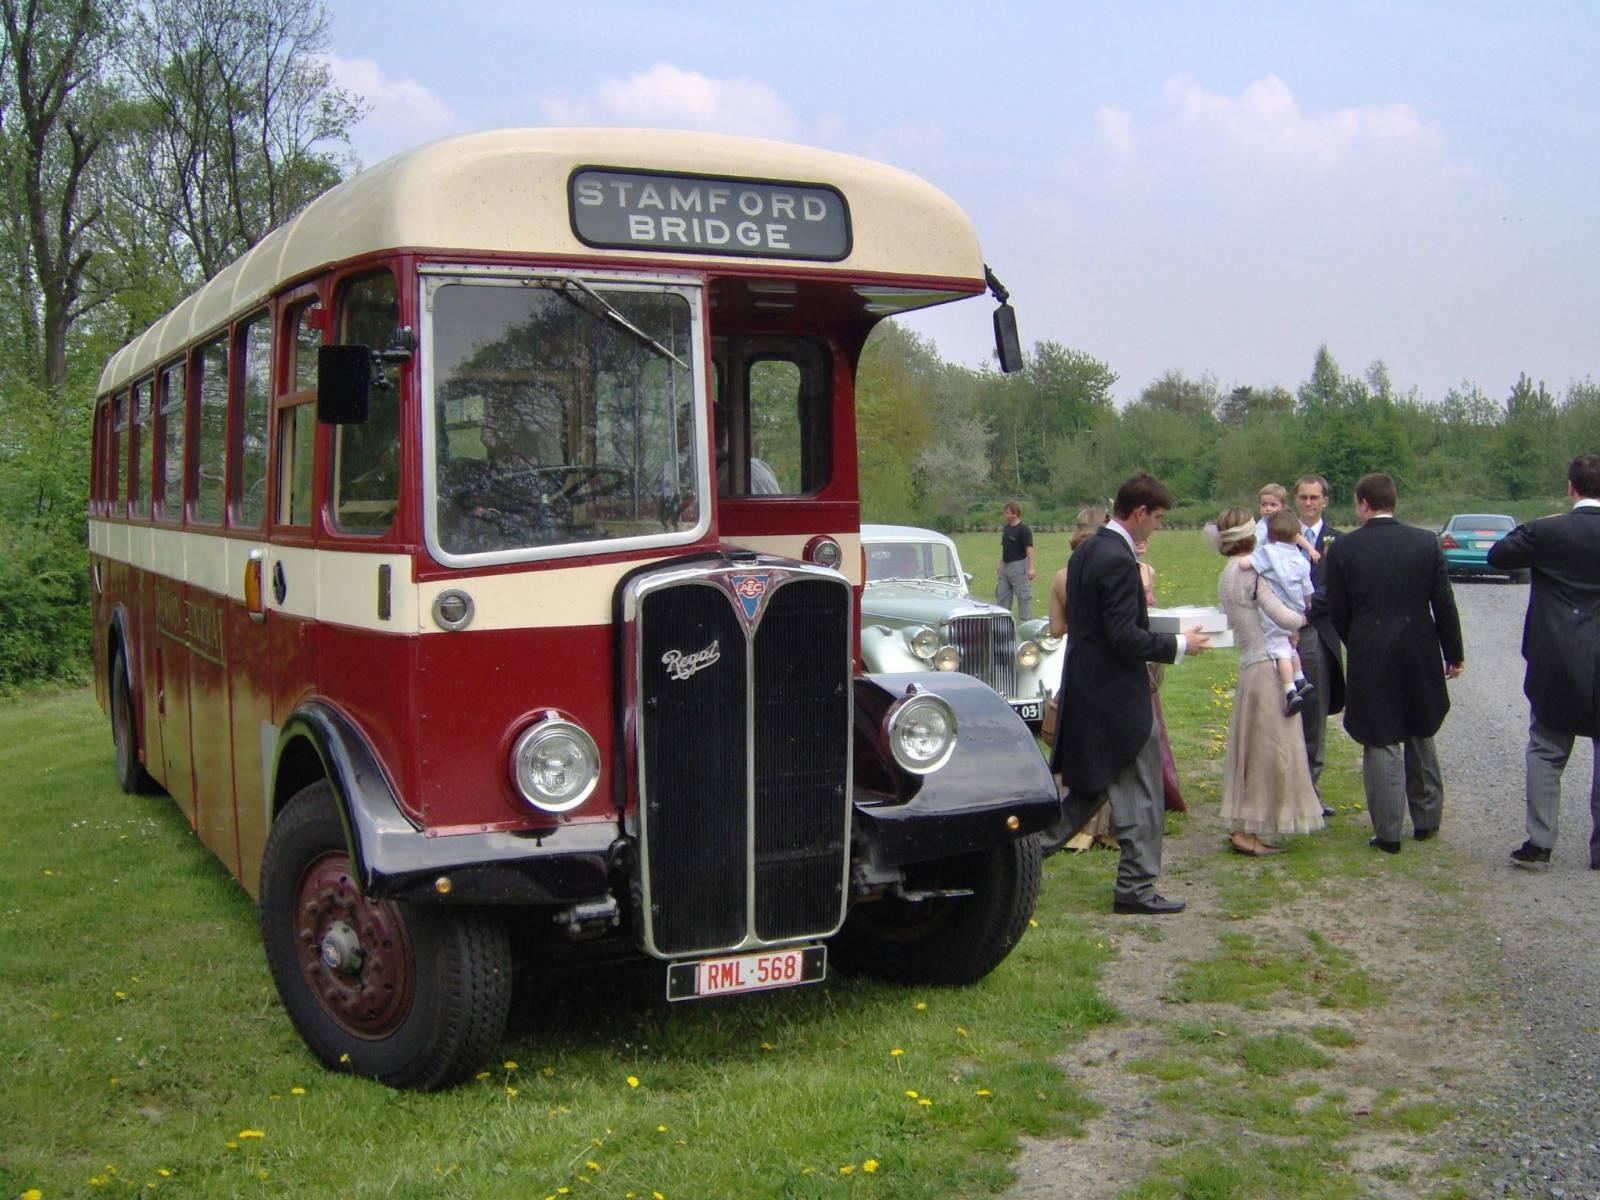 The London Ceremony Bus - Trouwvervoer - Ceremonievervoer - Bus - House of Weddings - 28